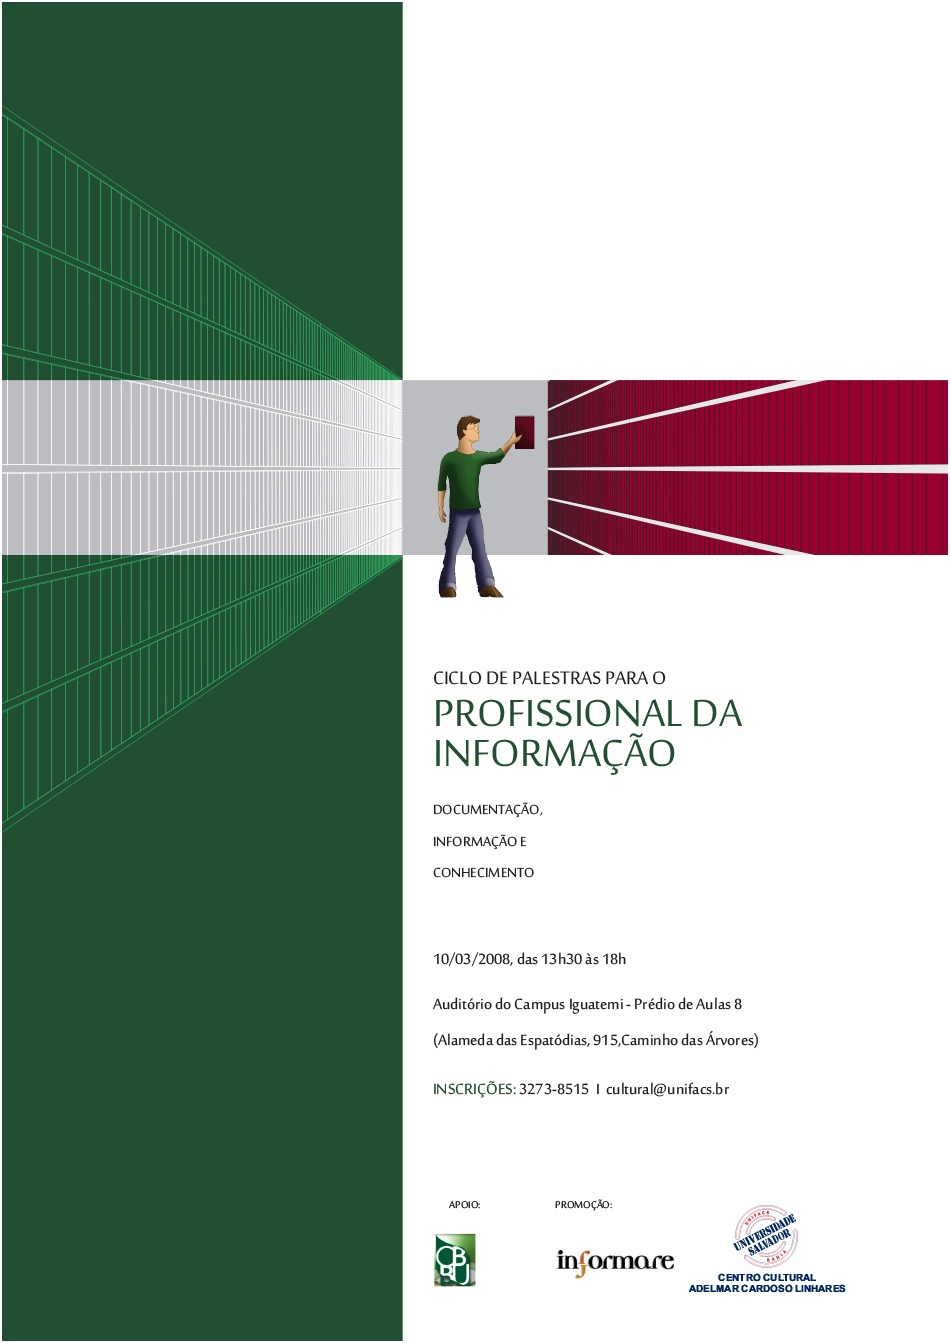 cartaz_ciclo_palestras_prof_info